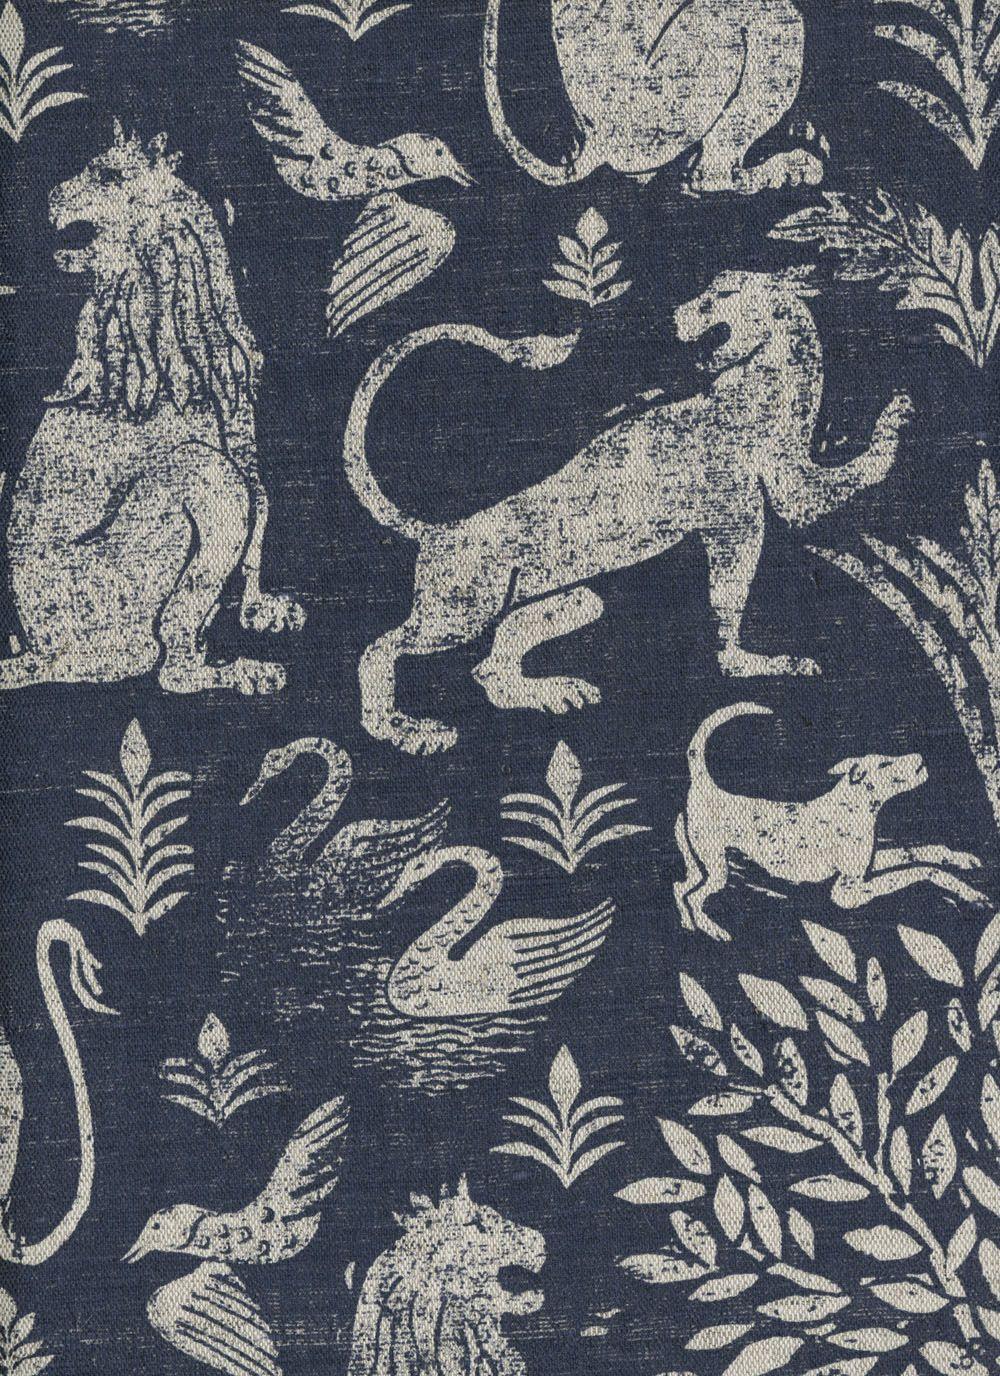 CITY OF LIONS Lindsay Alker Fabrics wallpapers Hand 1000x1376